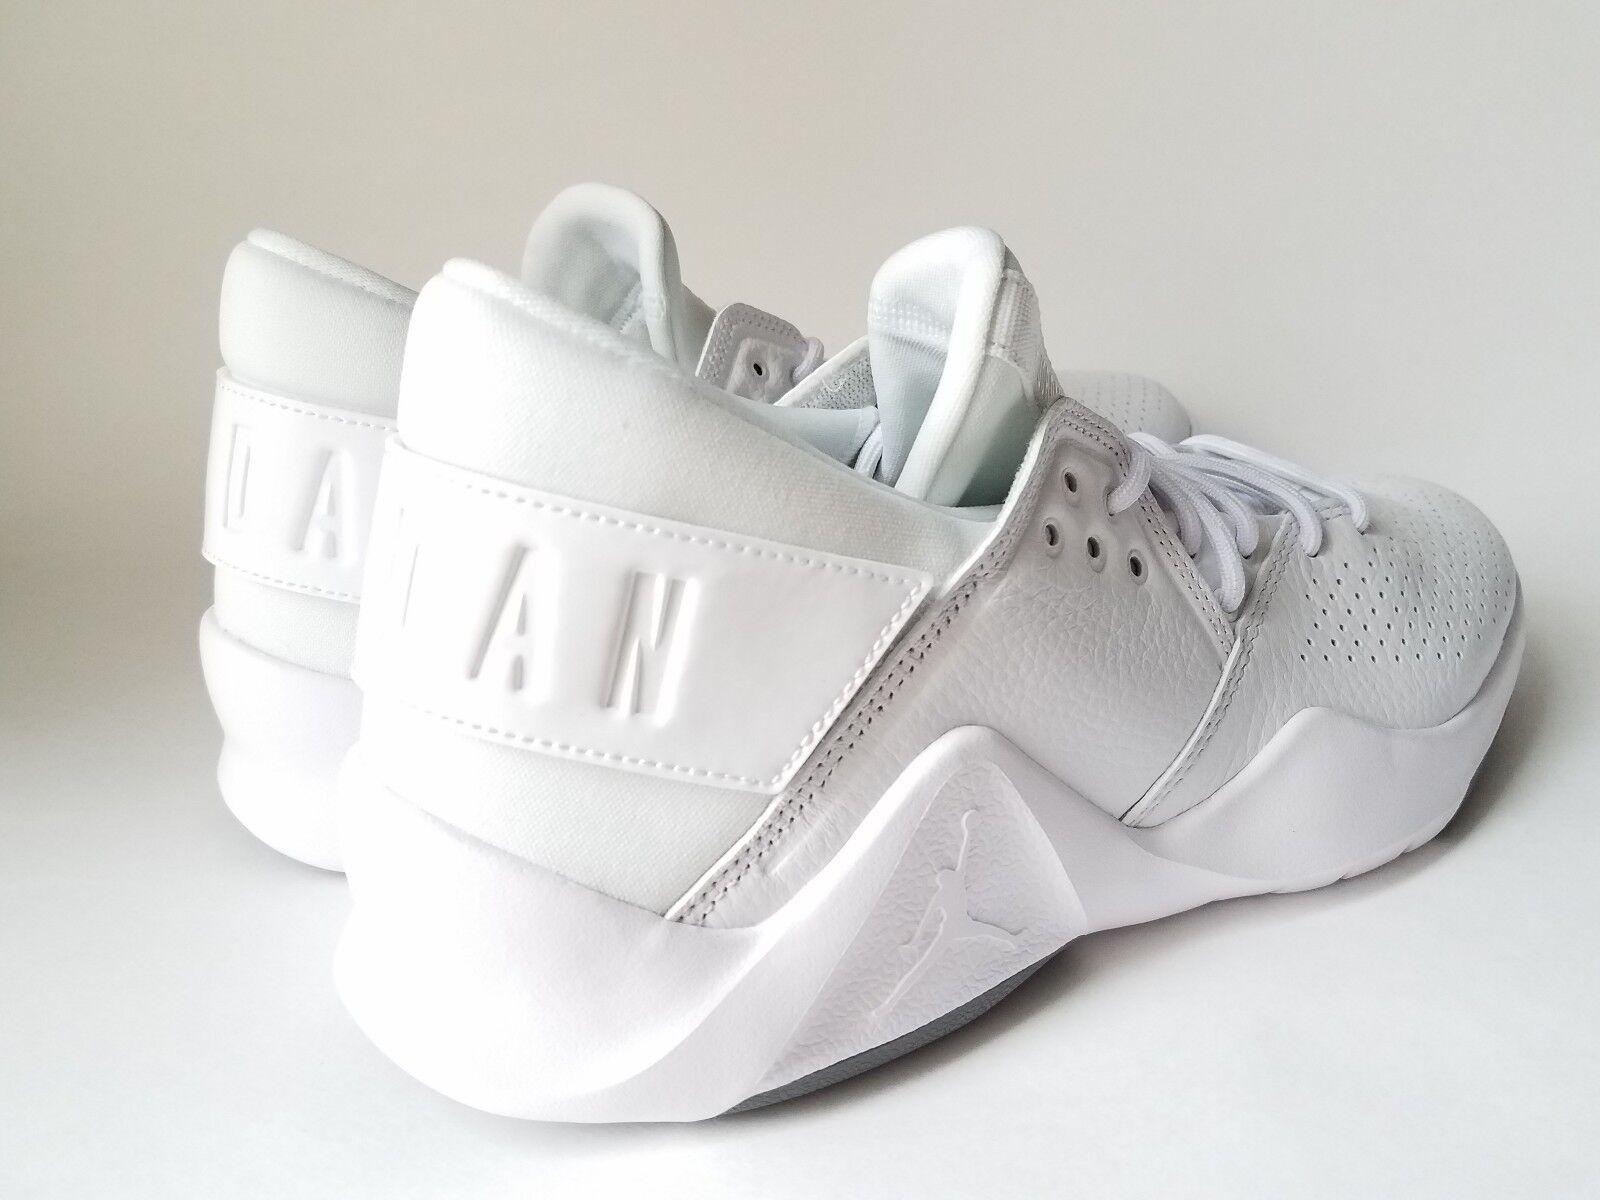 premium selection 993cf 54f52 ... Nike Jordan Flight Fresh PREM Premium Low White White White Men Basketball  shoes size 10 614bbc ...